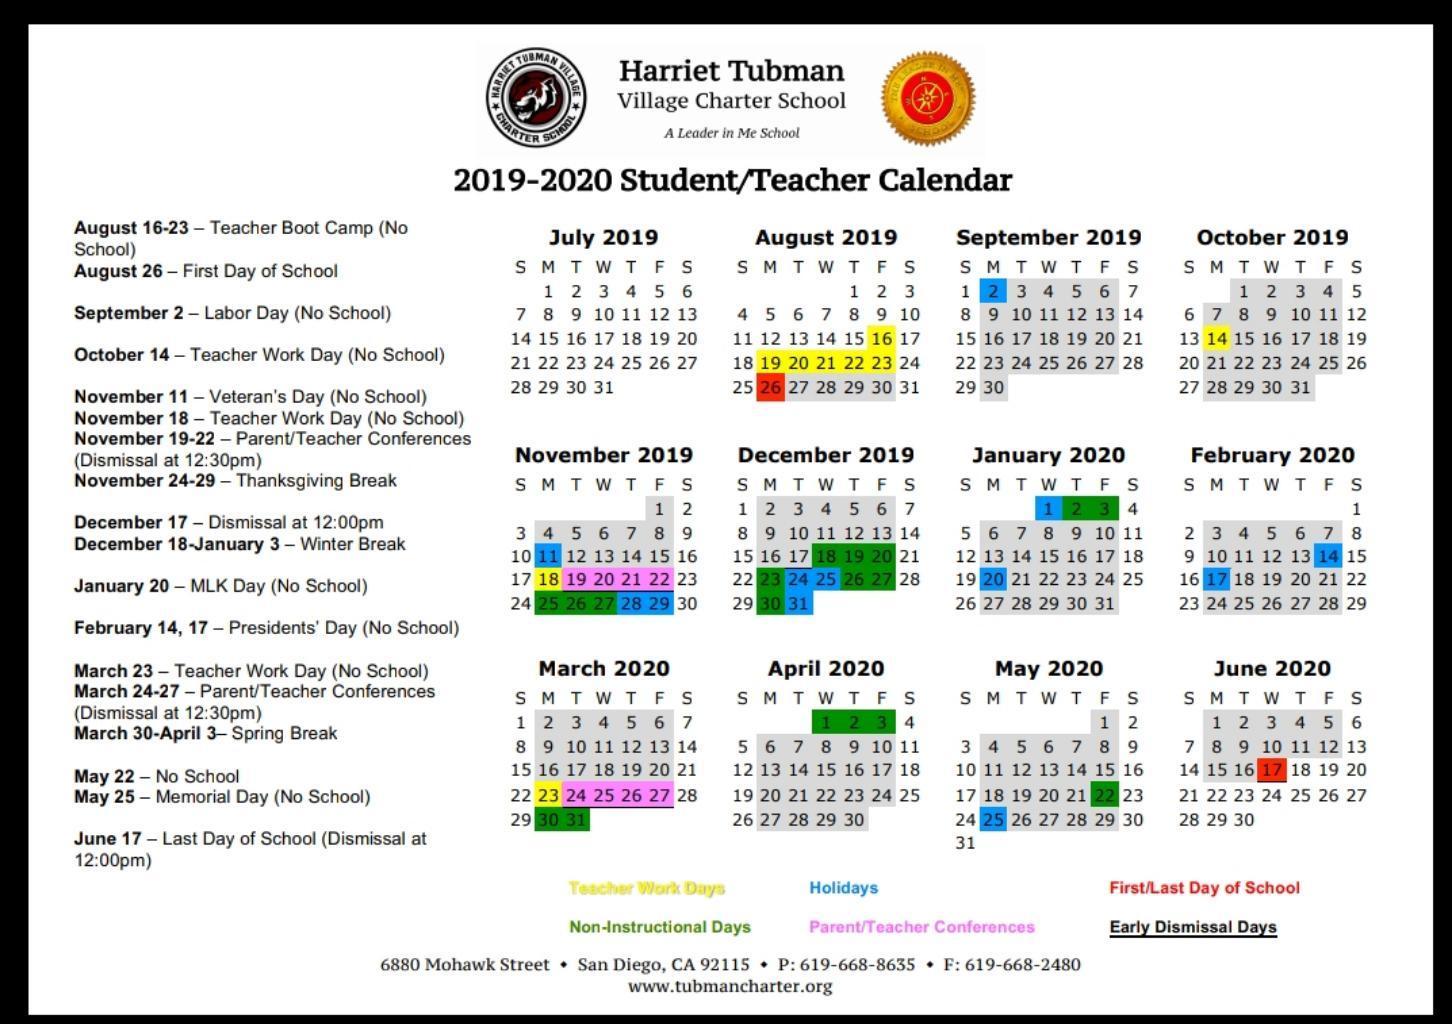 School Year Calendar 2019 20 – School Year Calendar 2019 20 Inside Grossmont High School Academic Calendar